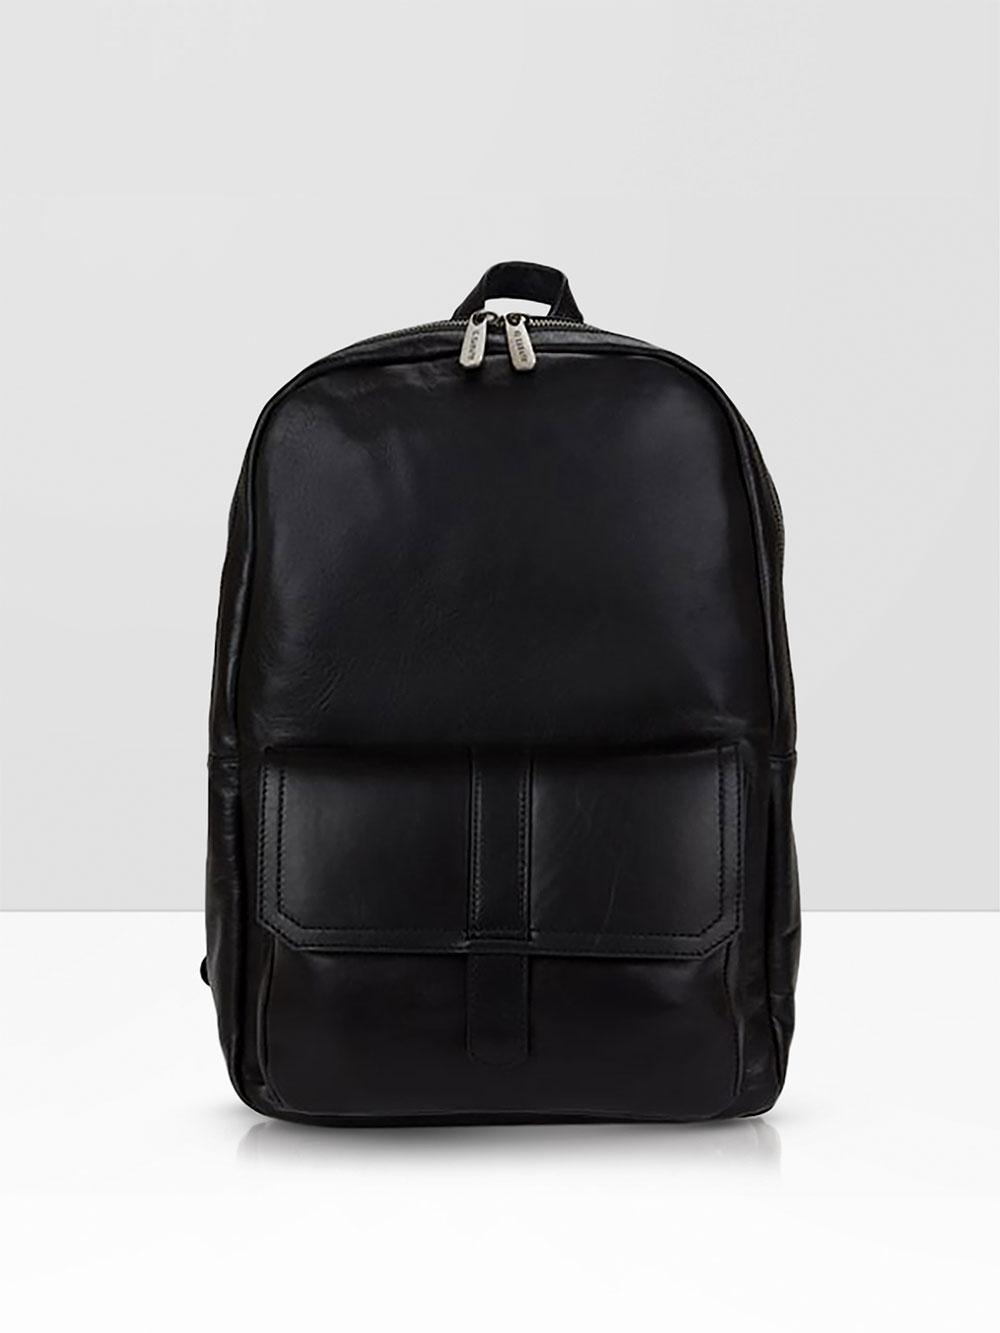 Men's leather backpacks